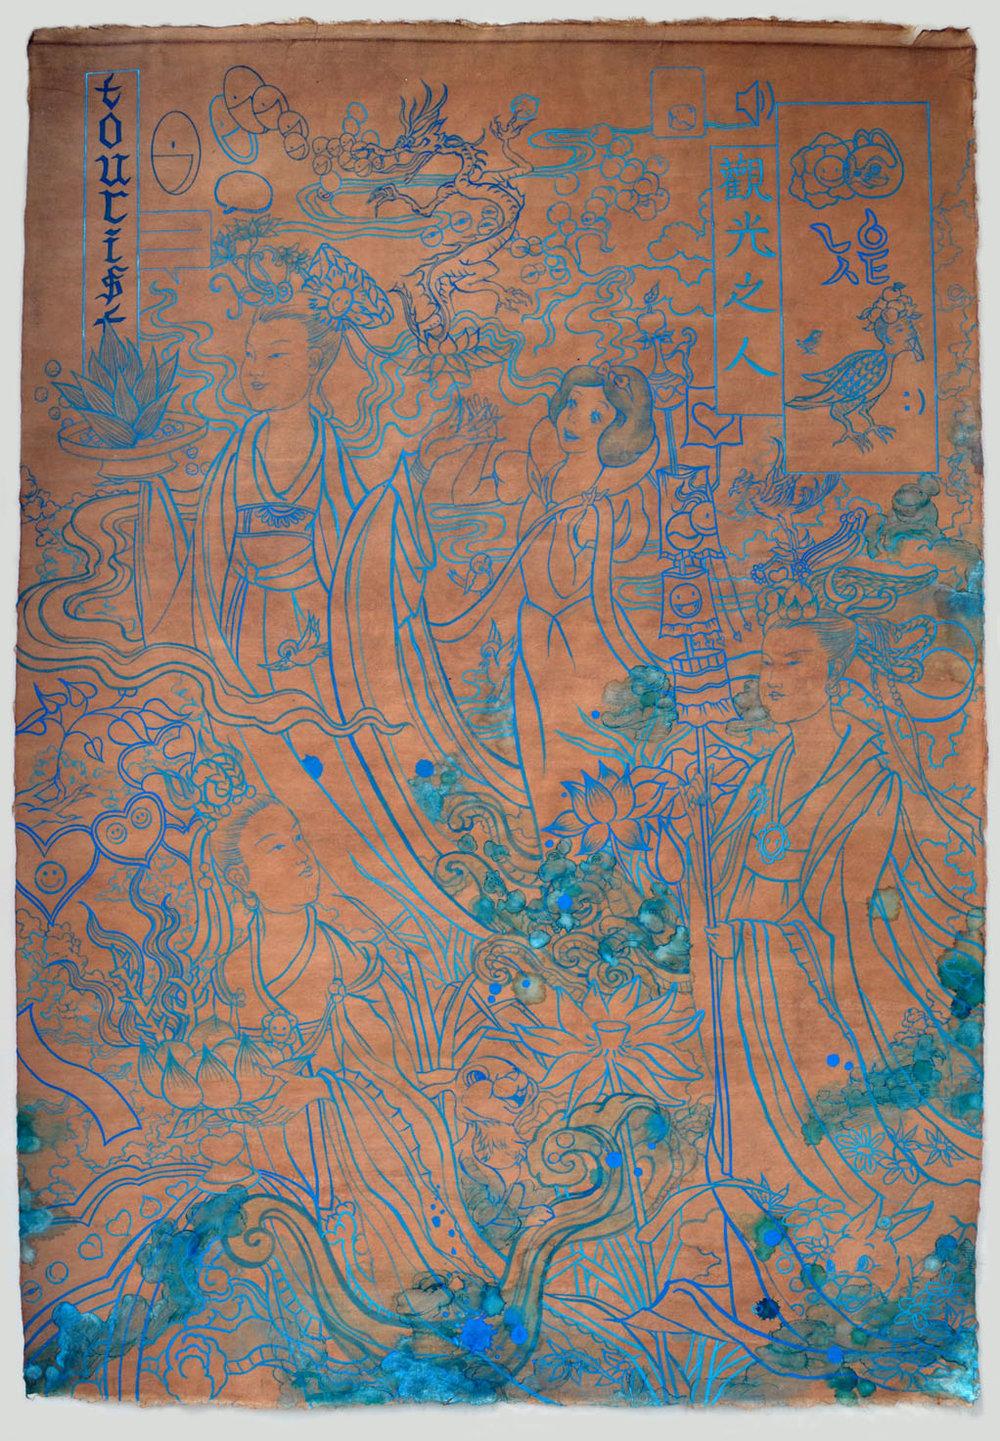 "Procession Detourist ,2012 Ink and acrylic, glitter on Hanji paper 36.5""x 25"""